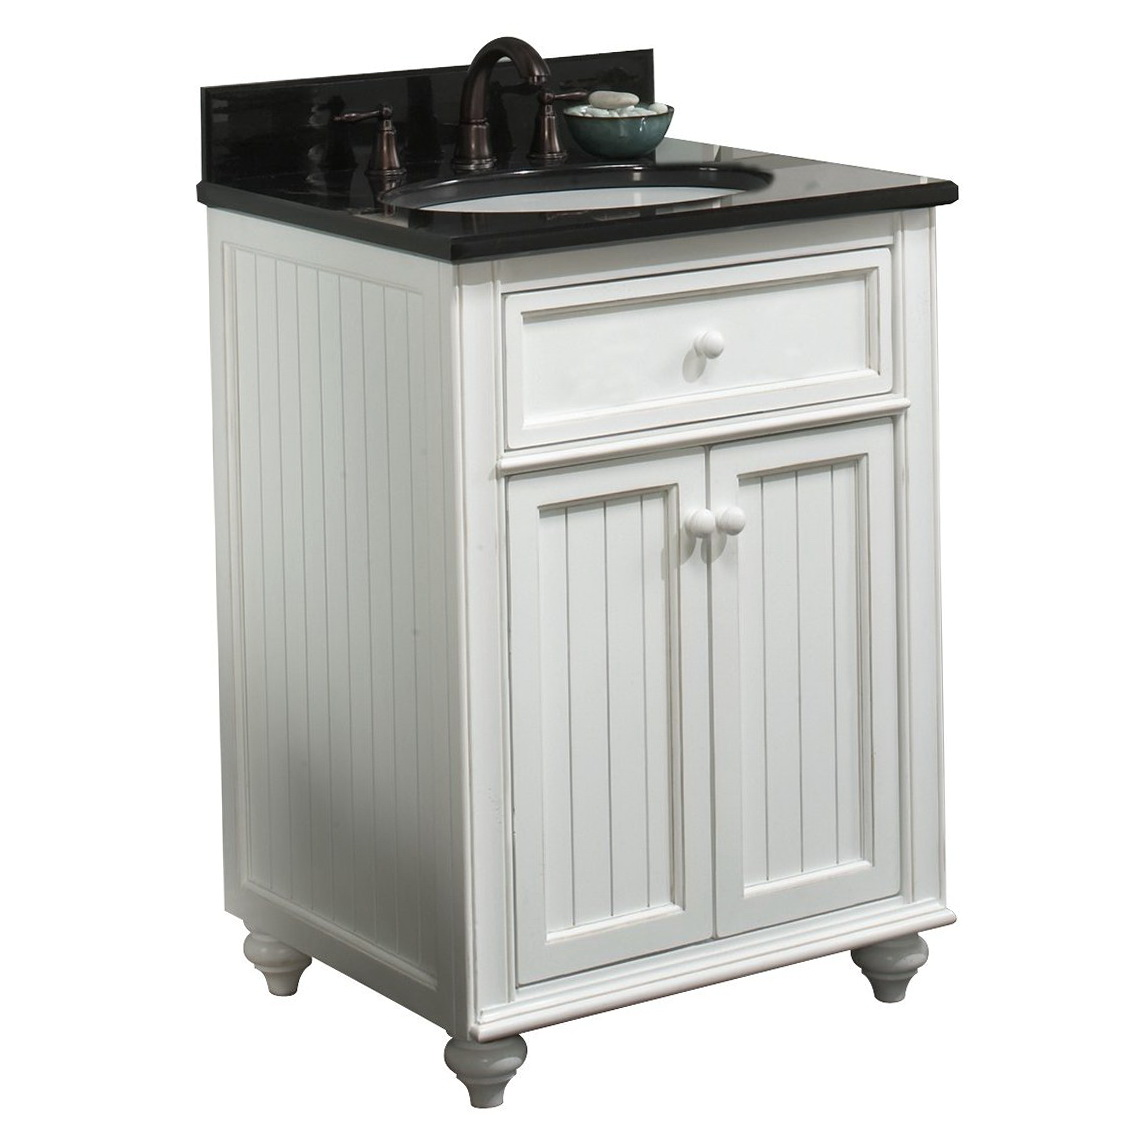 24 Inch Bathroom Vanity Cabinet